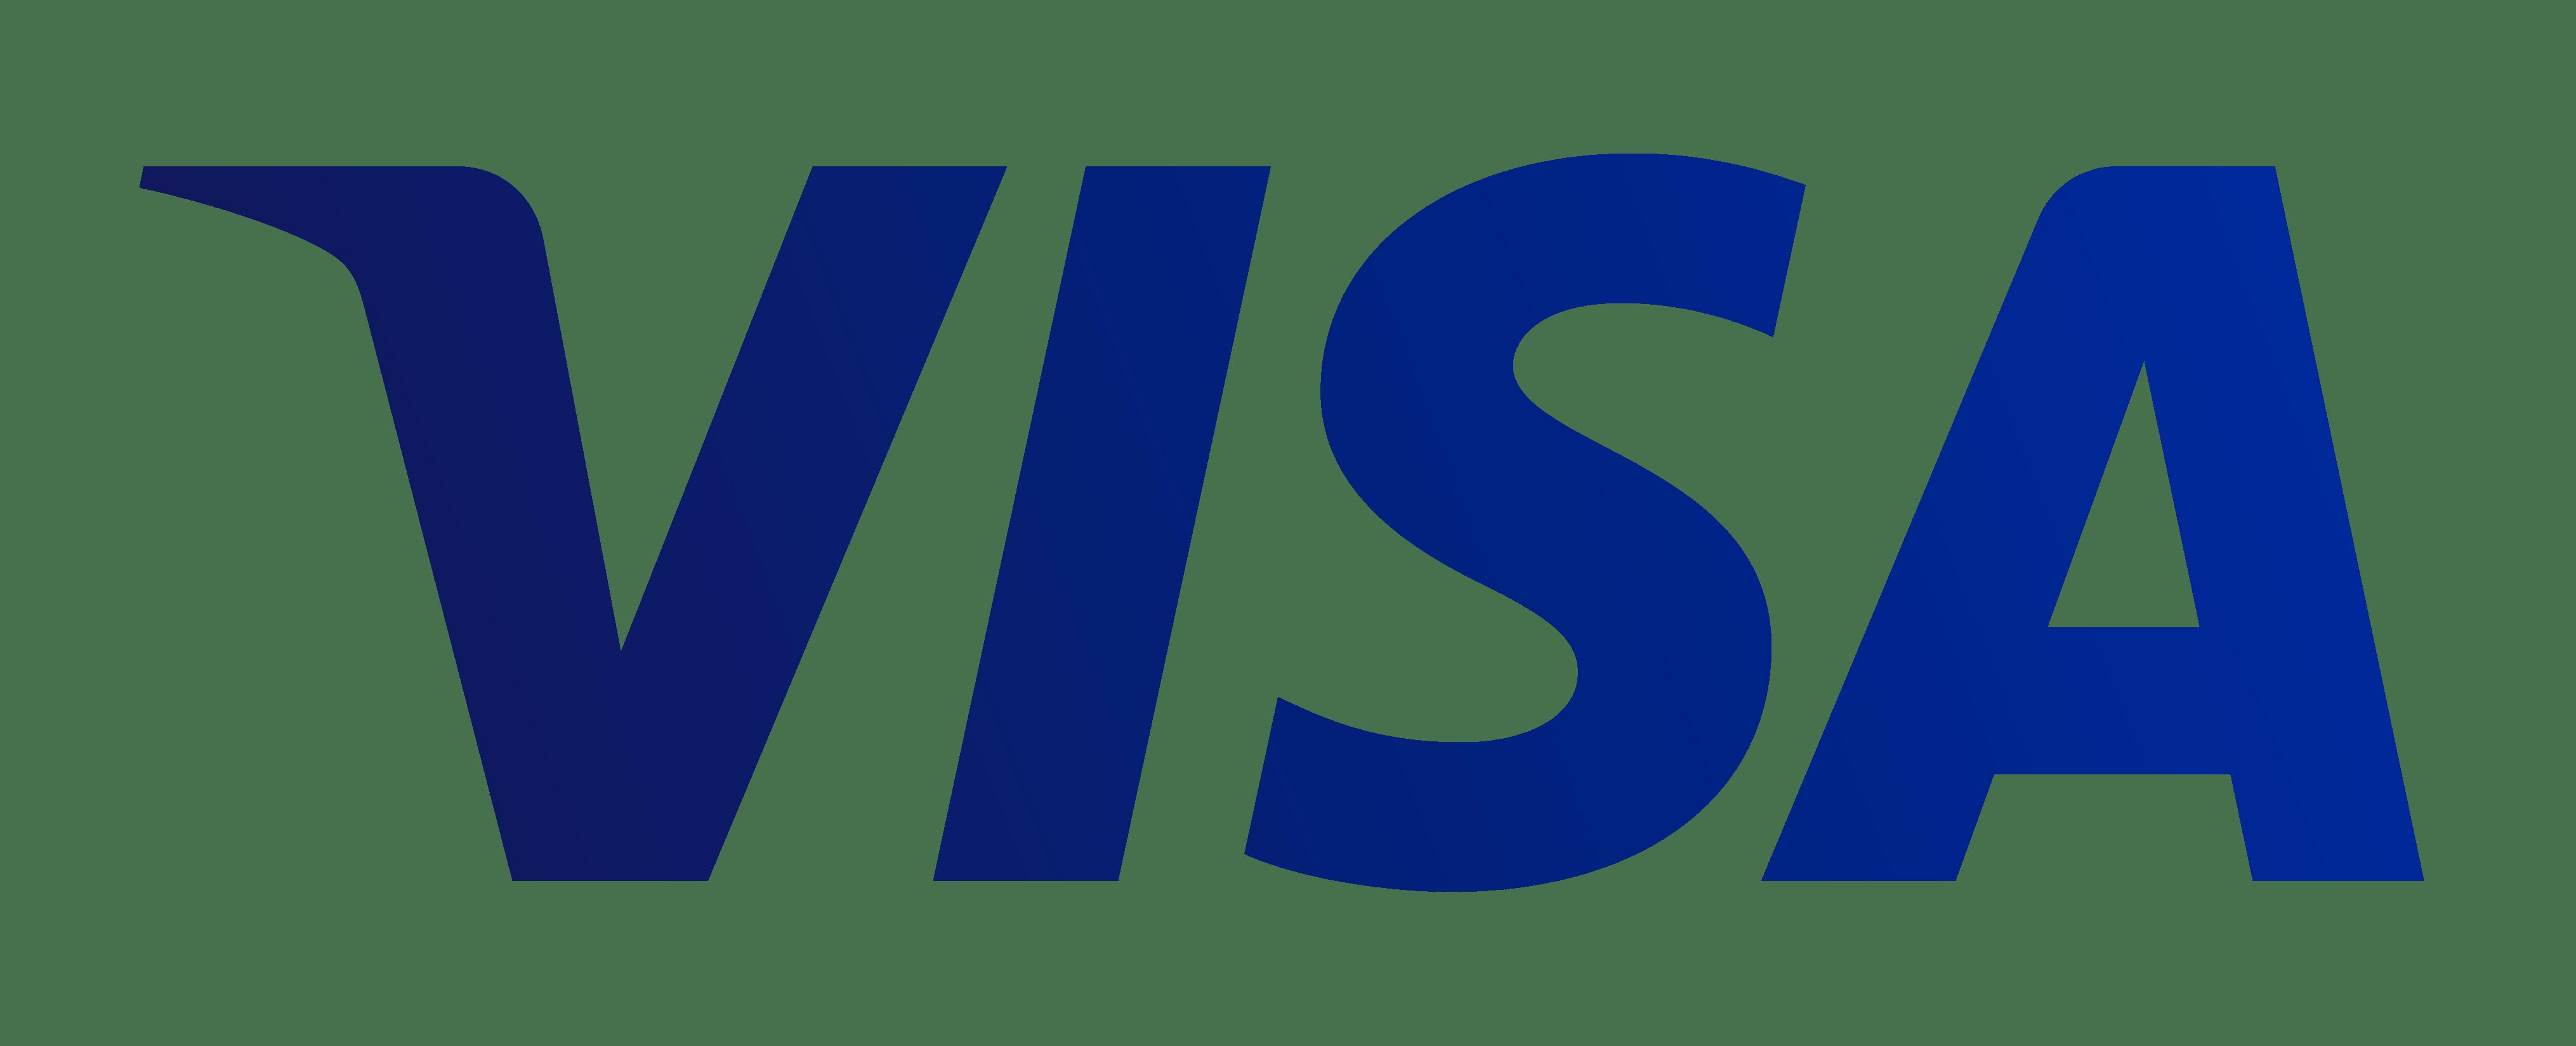 Visa Logo transparent PNG.